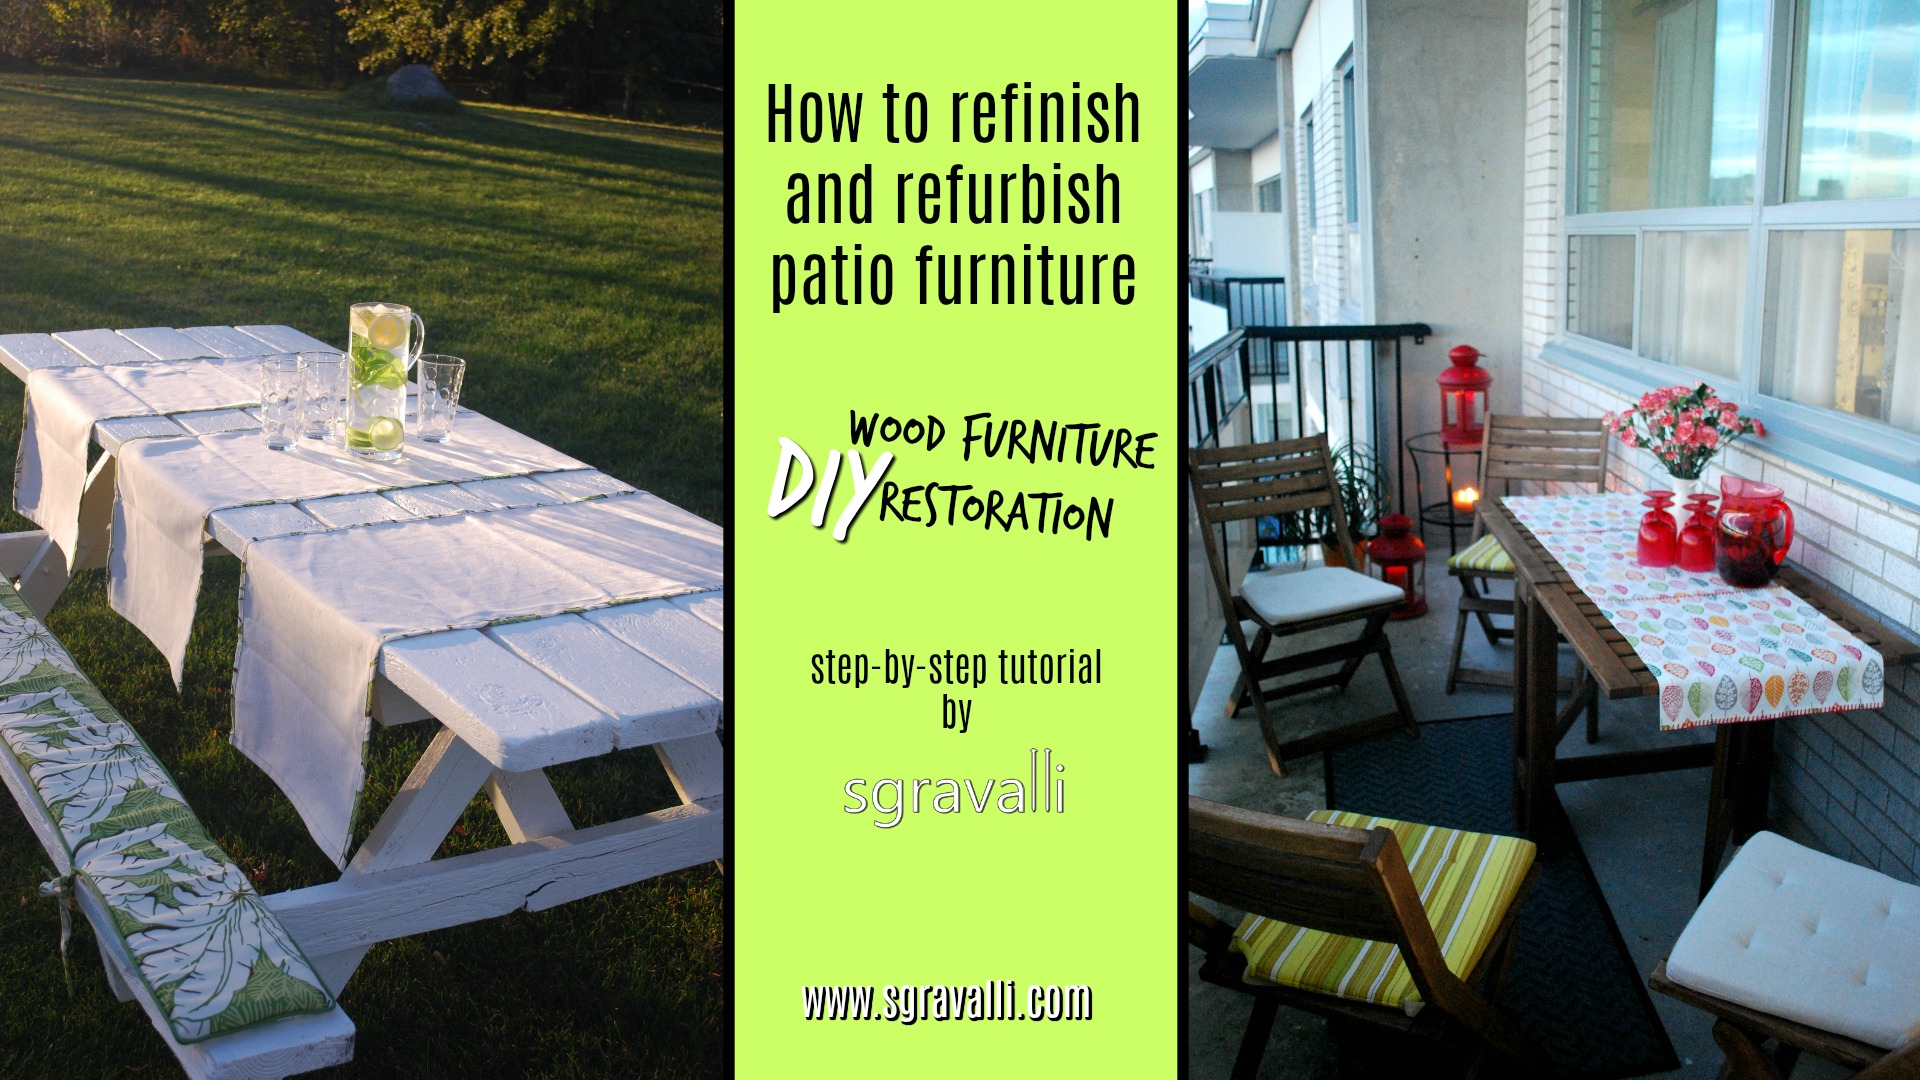 diy wood furniture restoration using